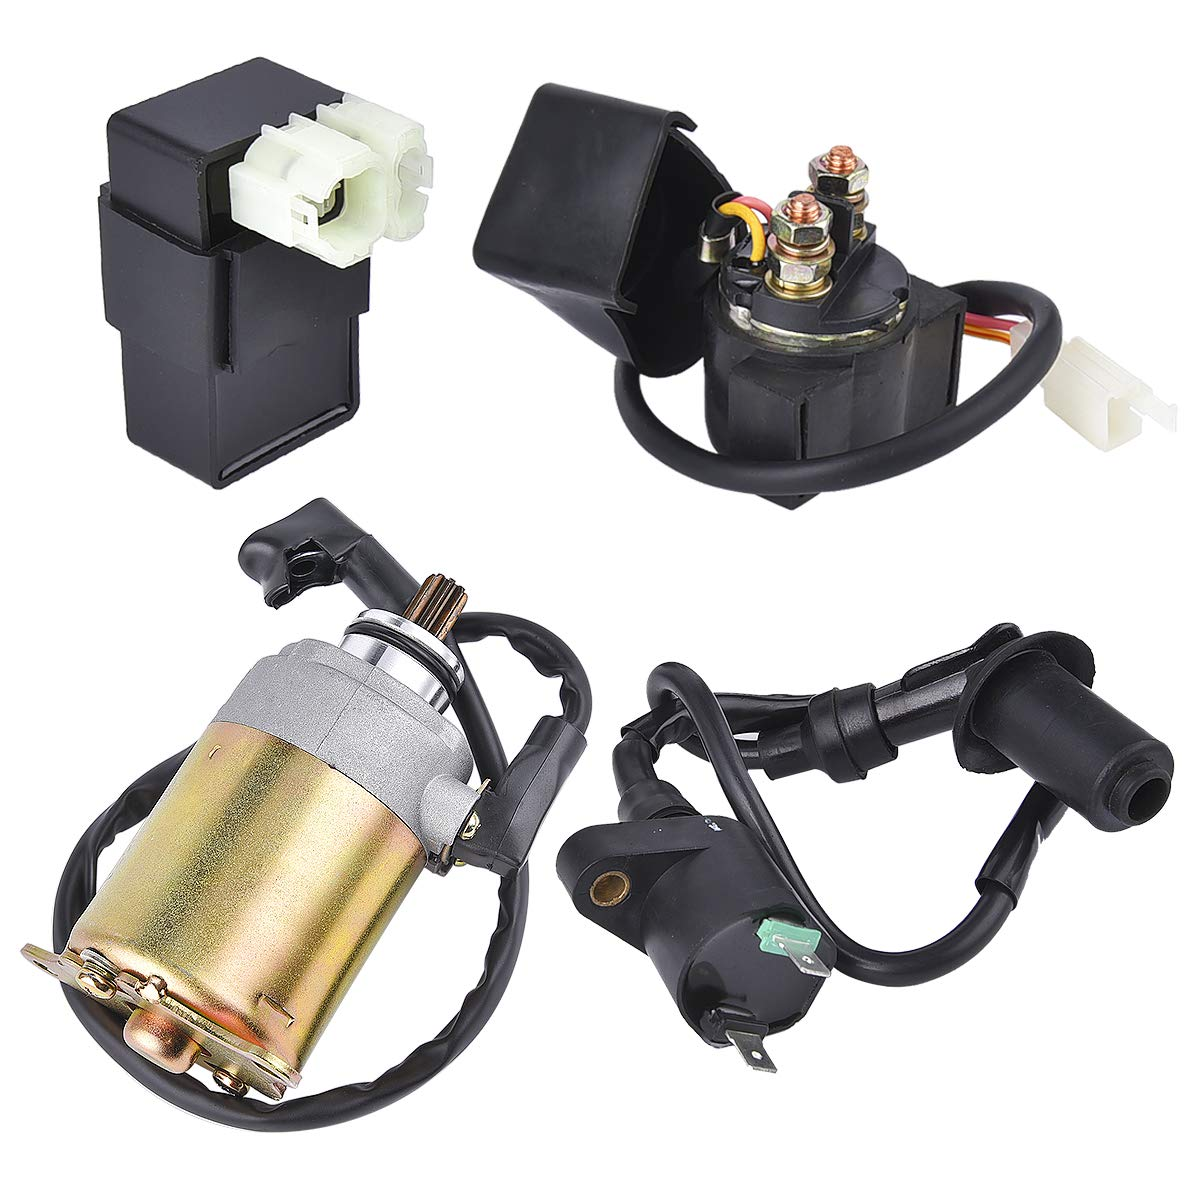 Electrical System Rebuild Kit for Carter Bros Talon Gx125IIR GX150IIR 150cc Go Kart